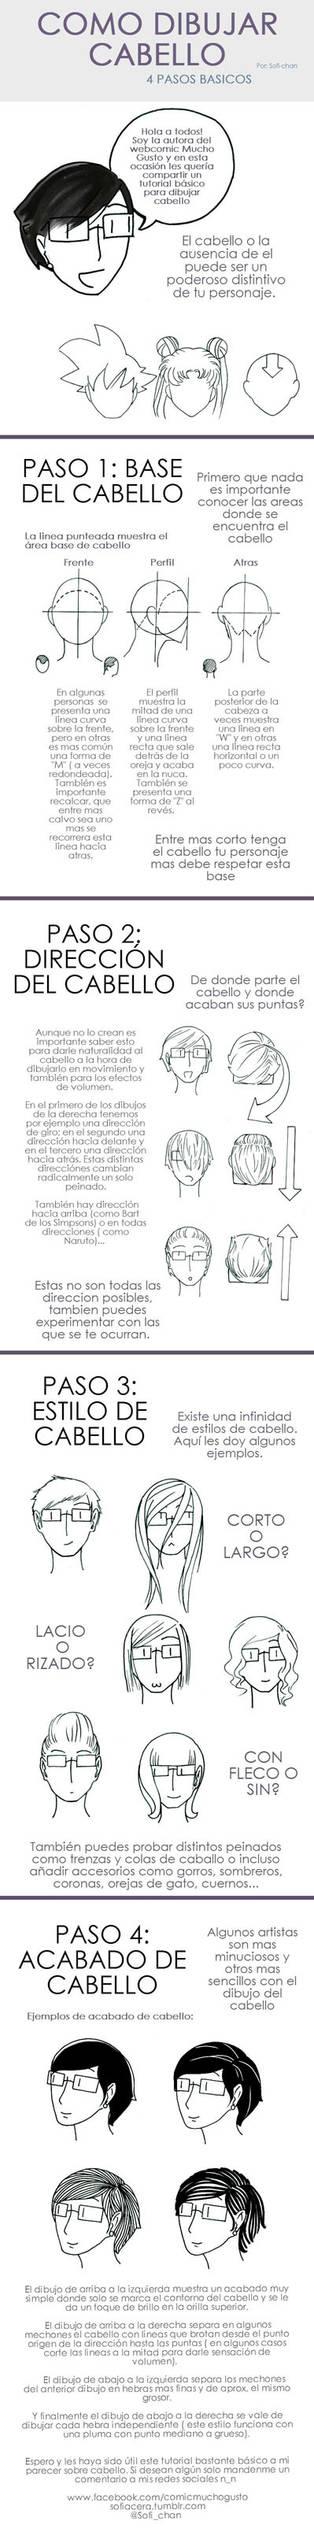 Tutorial para dibujar cabello